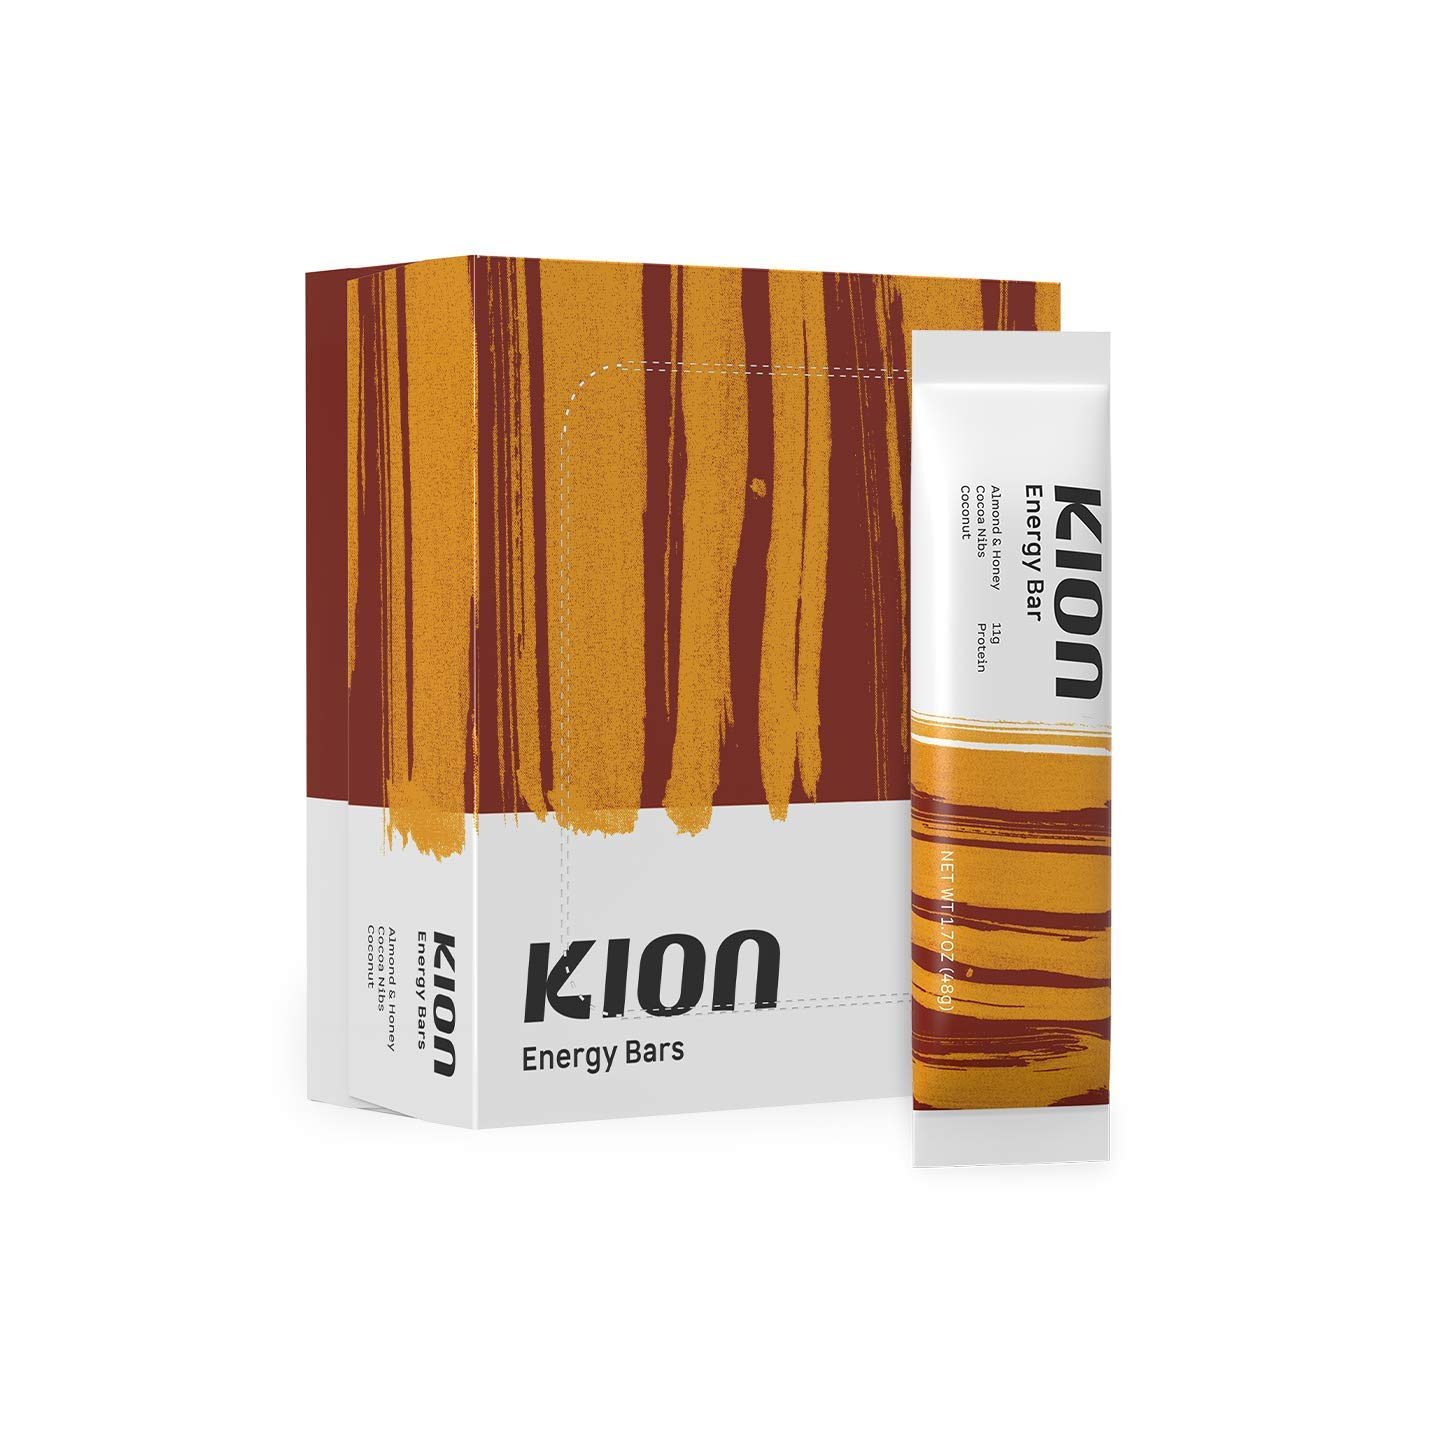 Kion Bar   Satisfying, Real-Food Energy Bar   Stable Energy and No Sugar Crashes   12 Bar Box